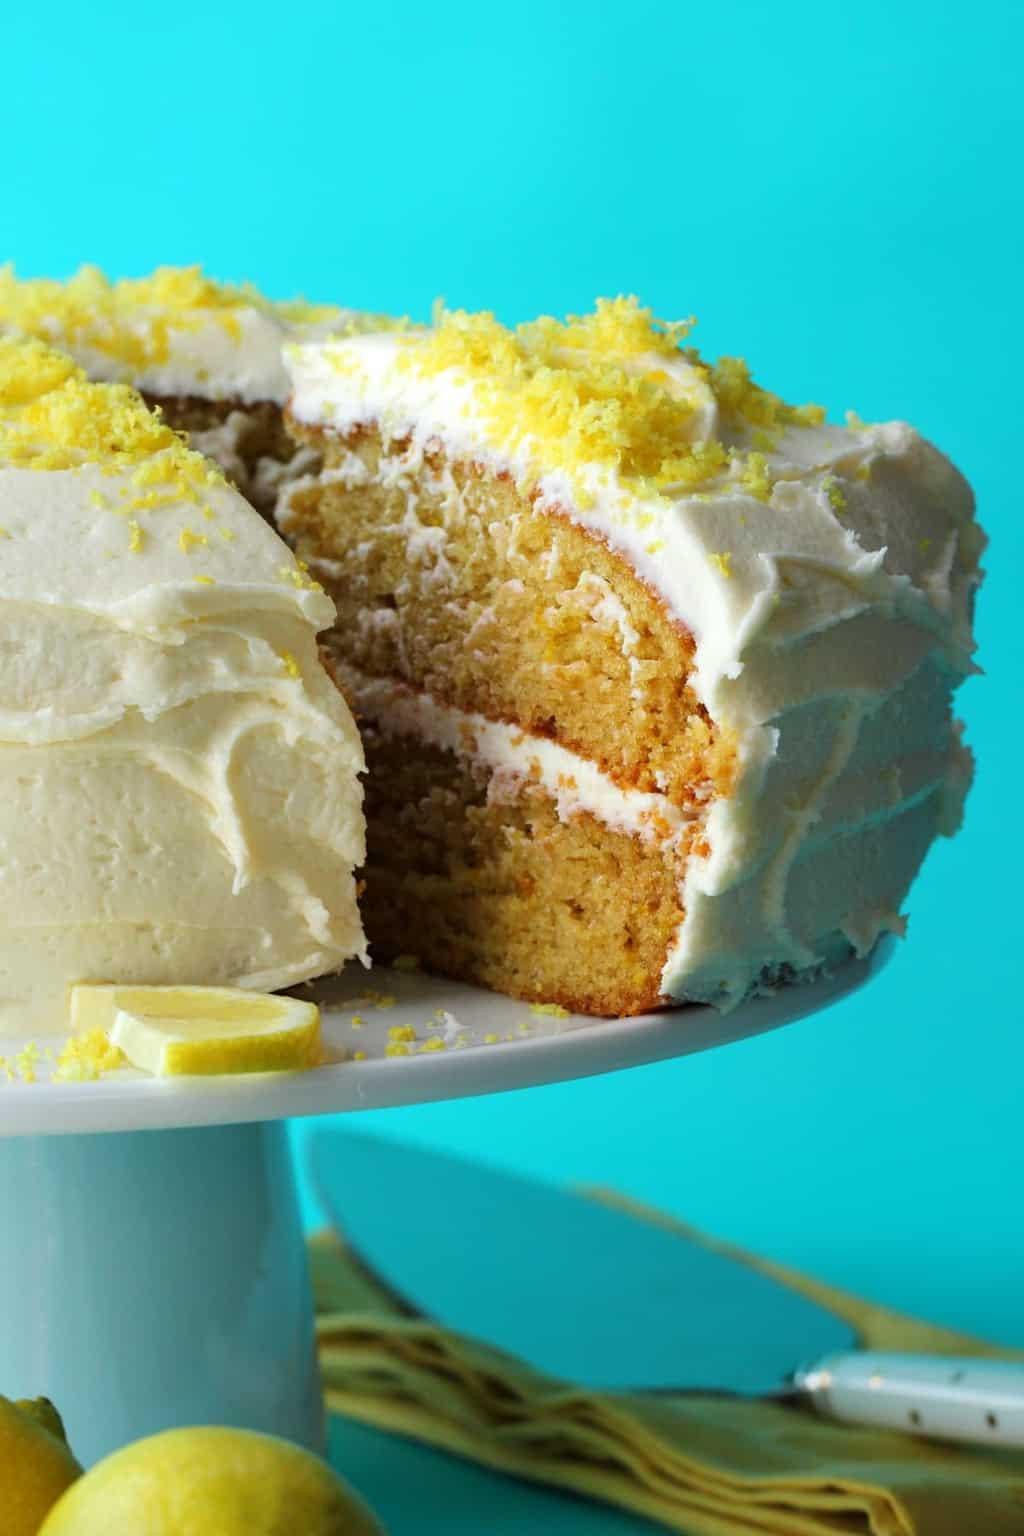 Vegan Lemon Cake Recipes  Vegan Lemon Cake – Spongey 2 Layer Dream Cake Recipes